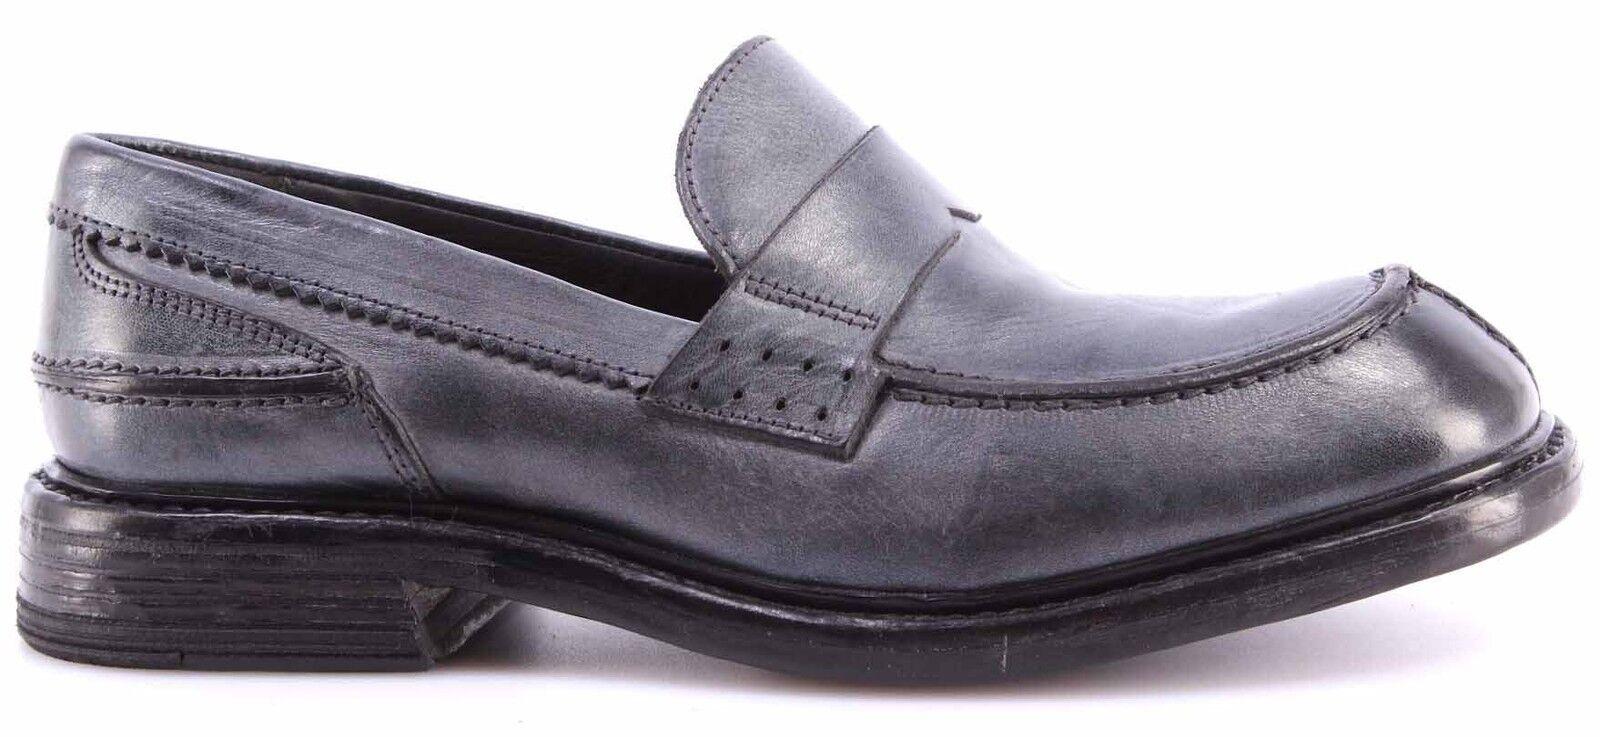 shoes women Mocassini Slip On MOMA 73502-6F Ghost Platino Pelle Vintage